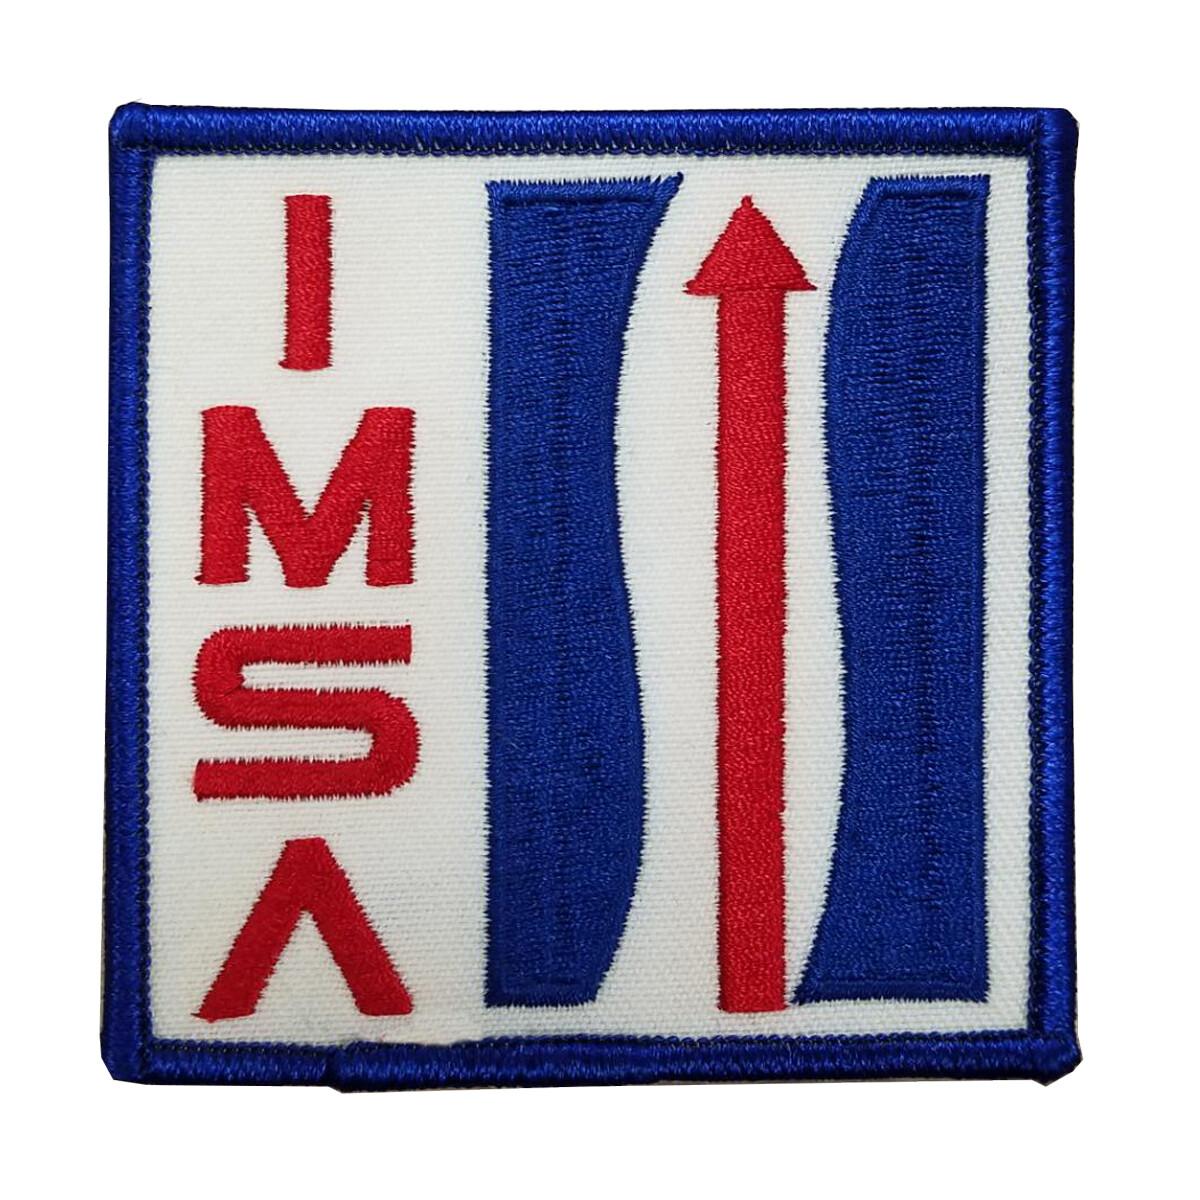 IMSA Vintage Logo Twill Patch